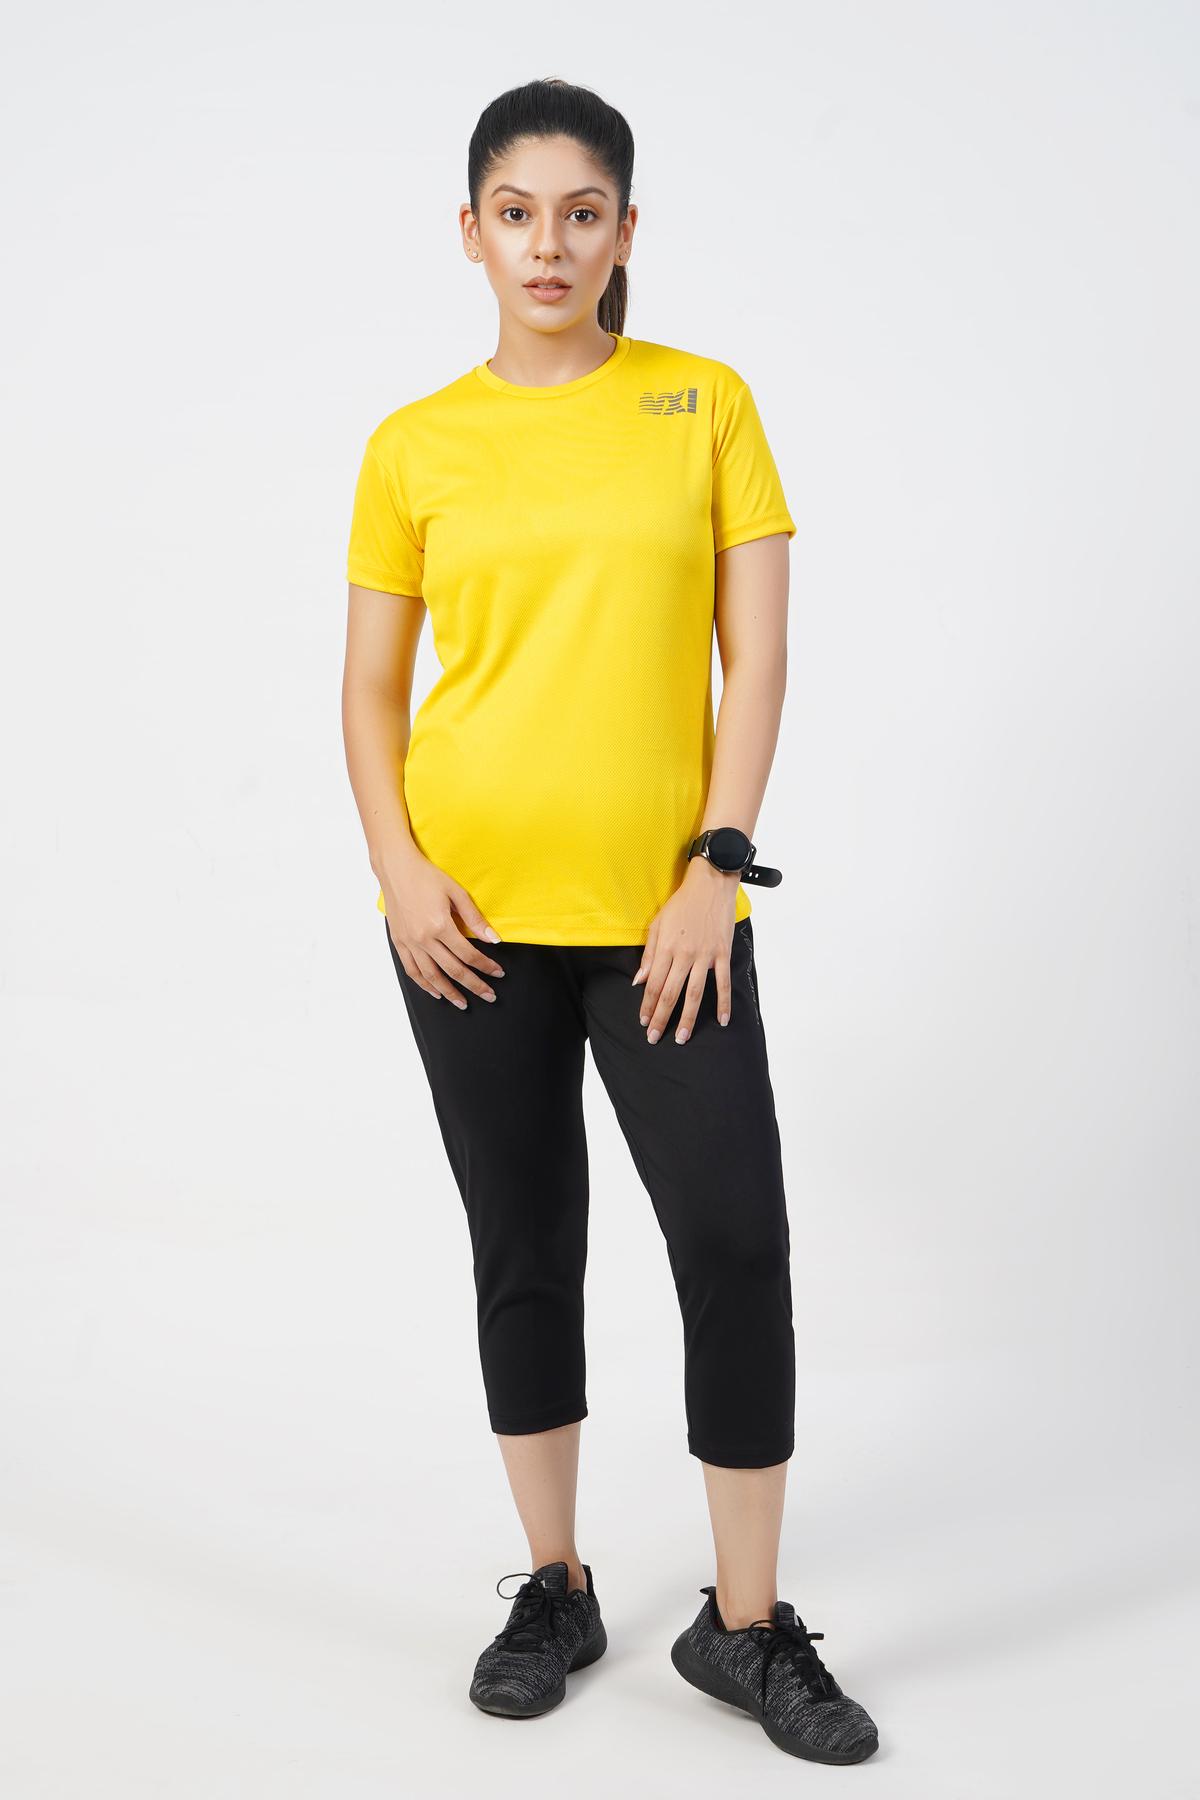 Vital Micro Mesh Yellow T-Shirt